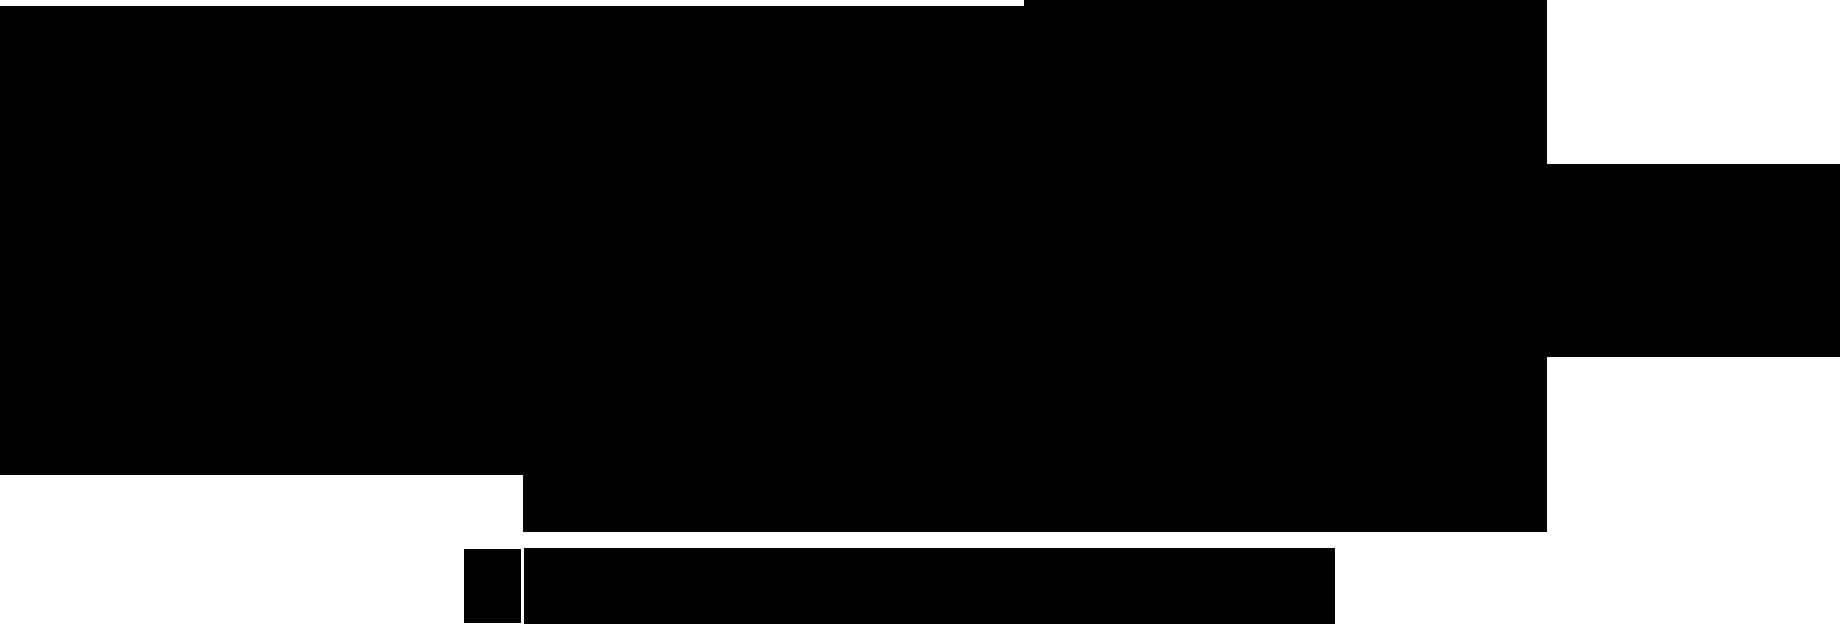 SaraTouijerLogo-black